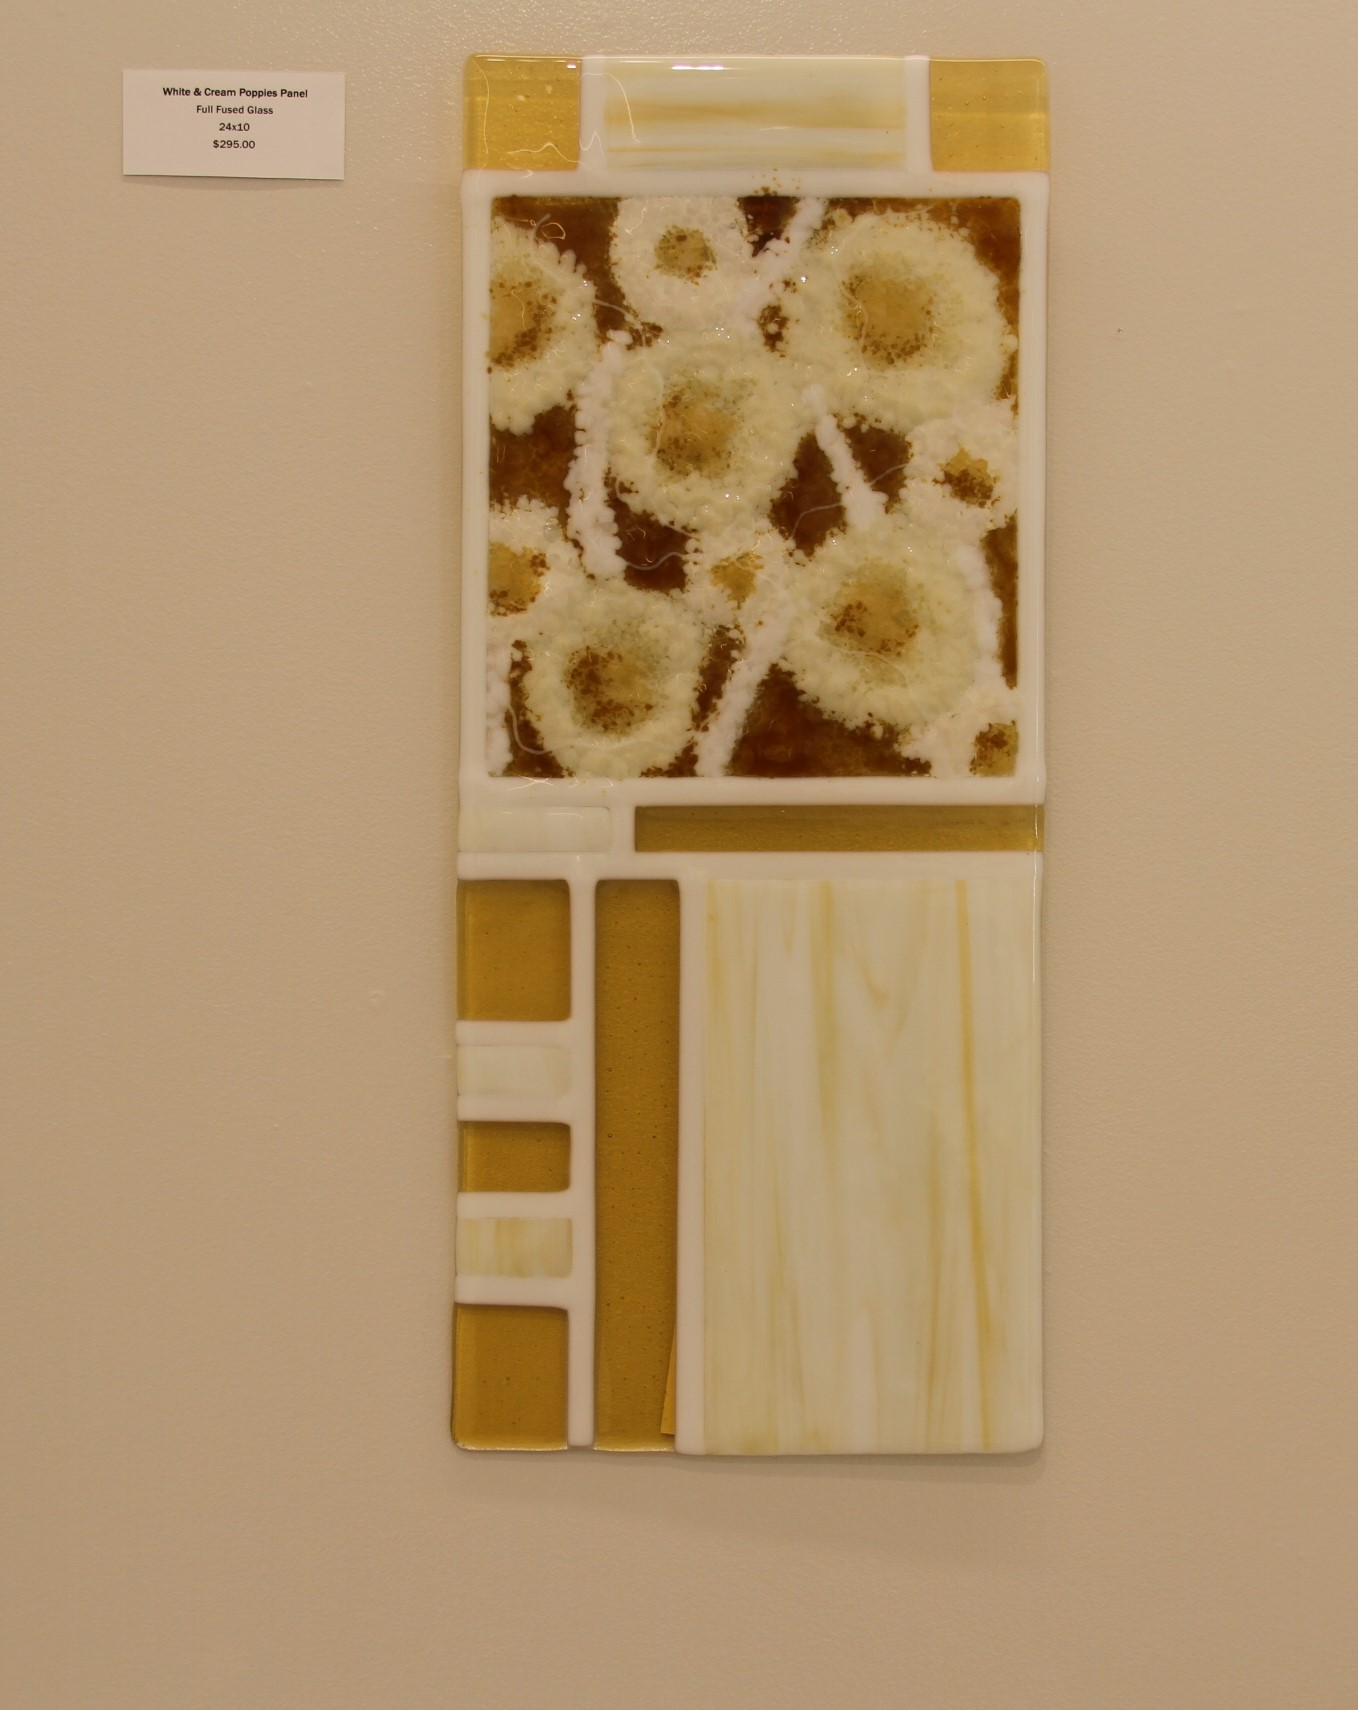 White Cream and Poppies Panel